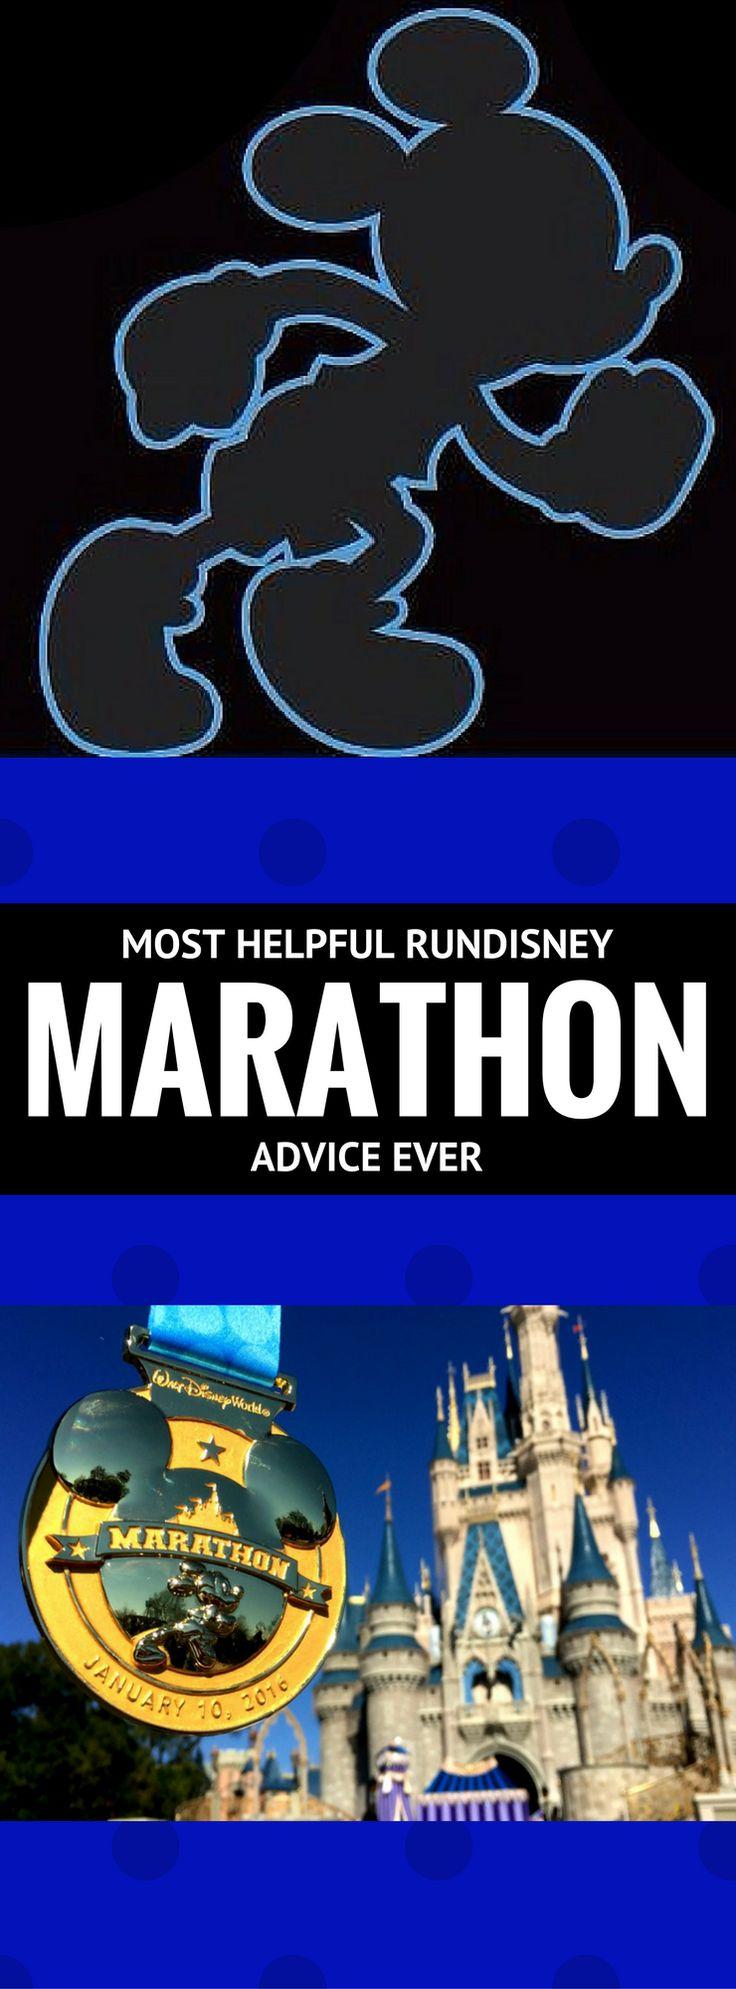 The most helpful runDisney Marathon advice ever! Running | Walt Disney World | Marathon | Marathon Weekend